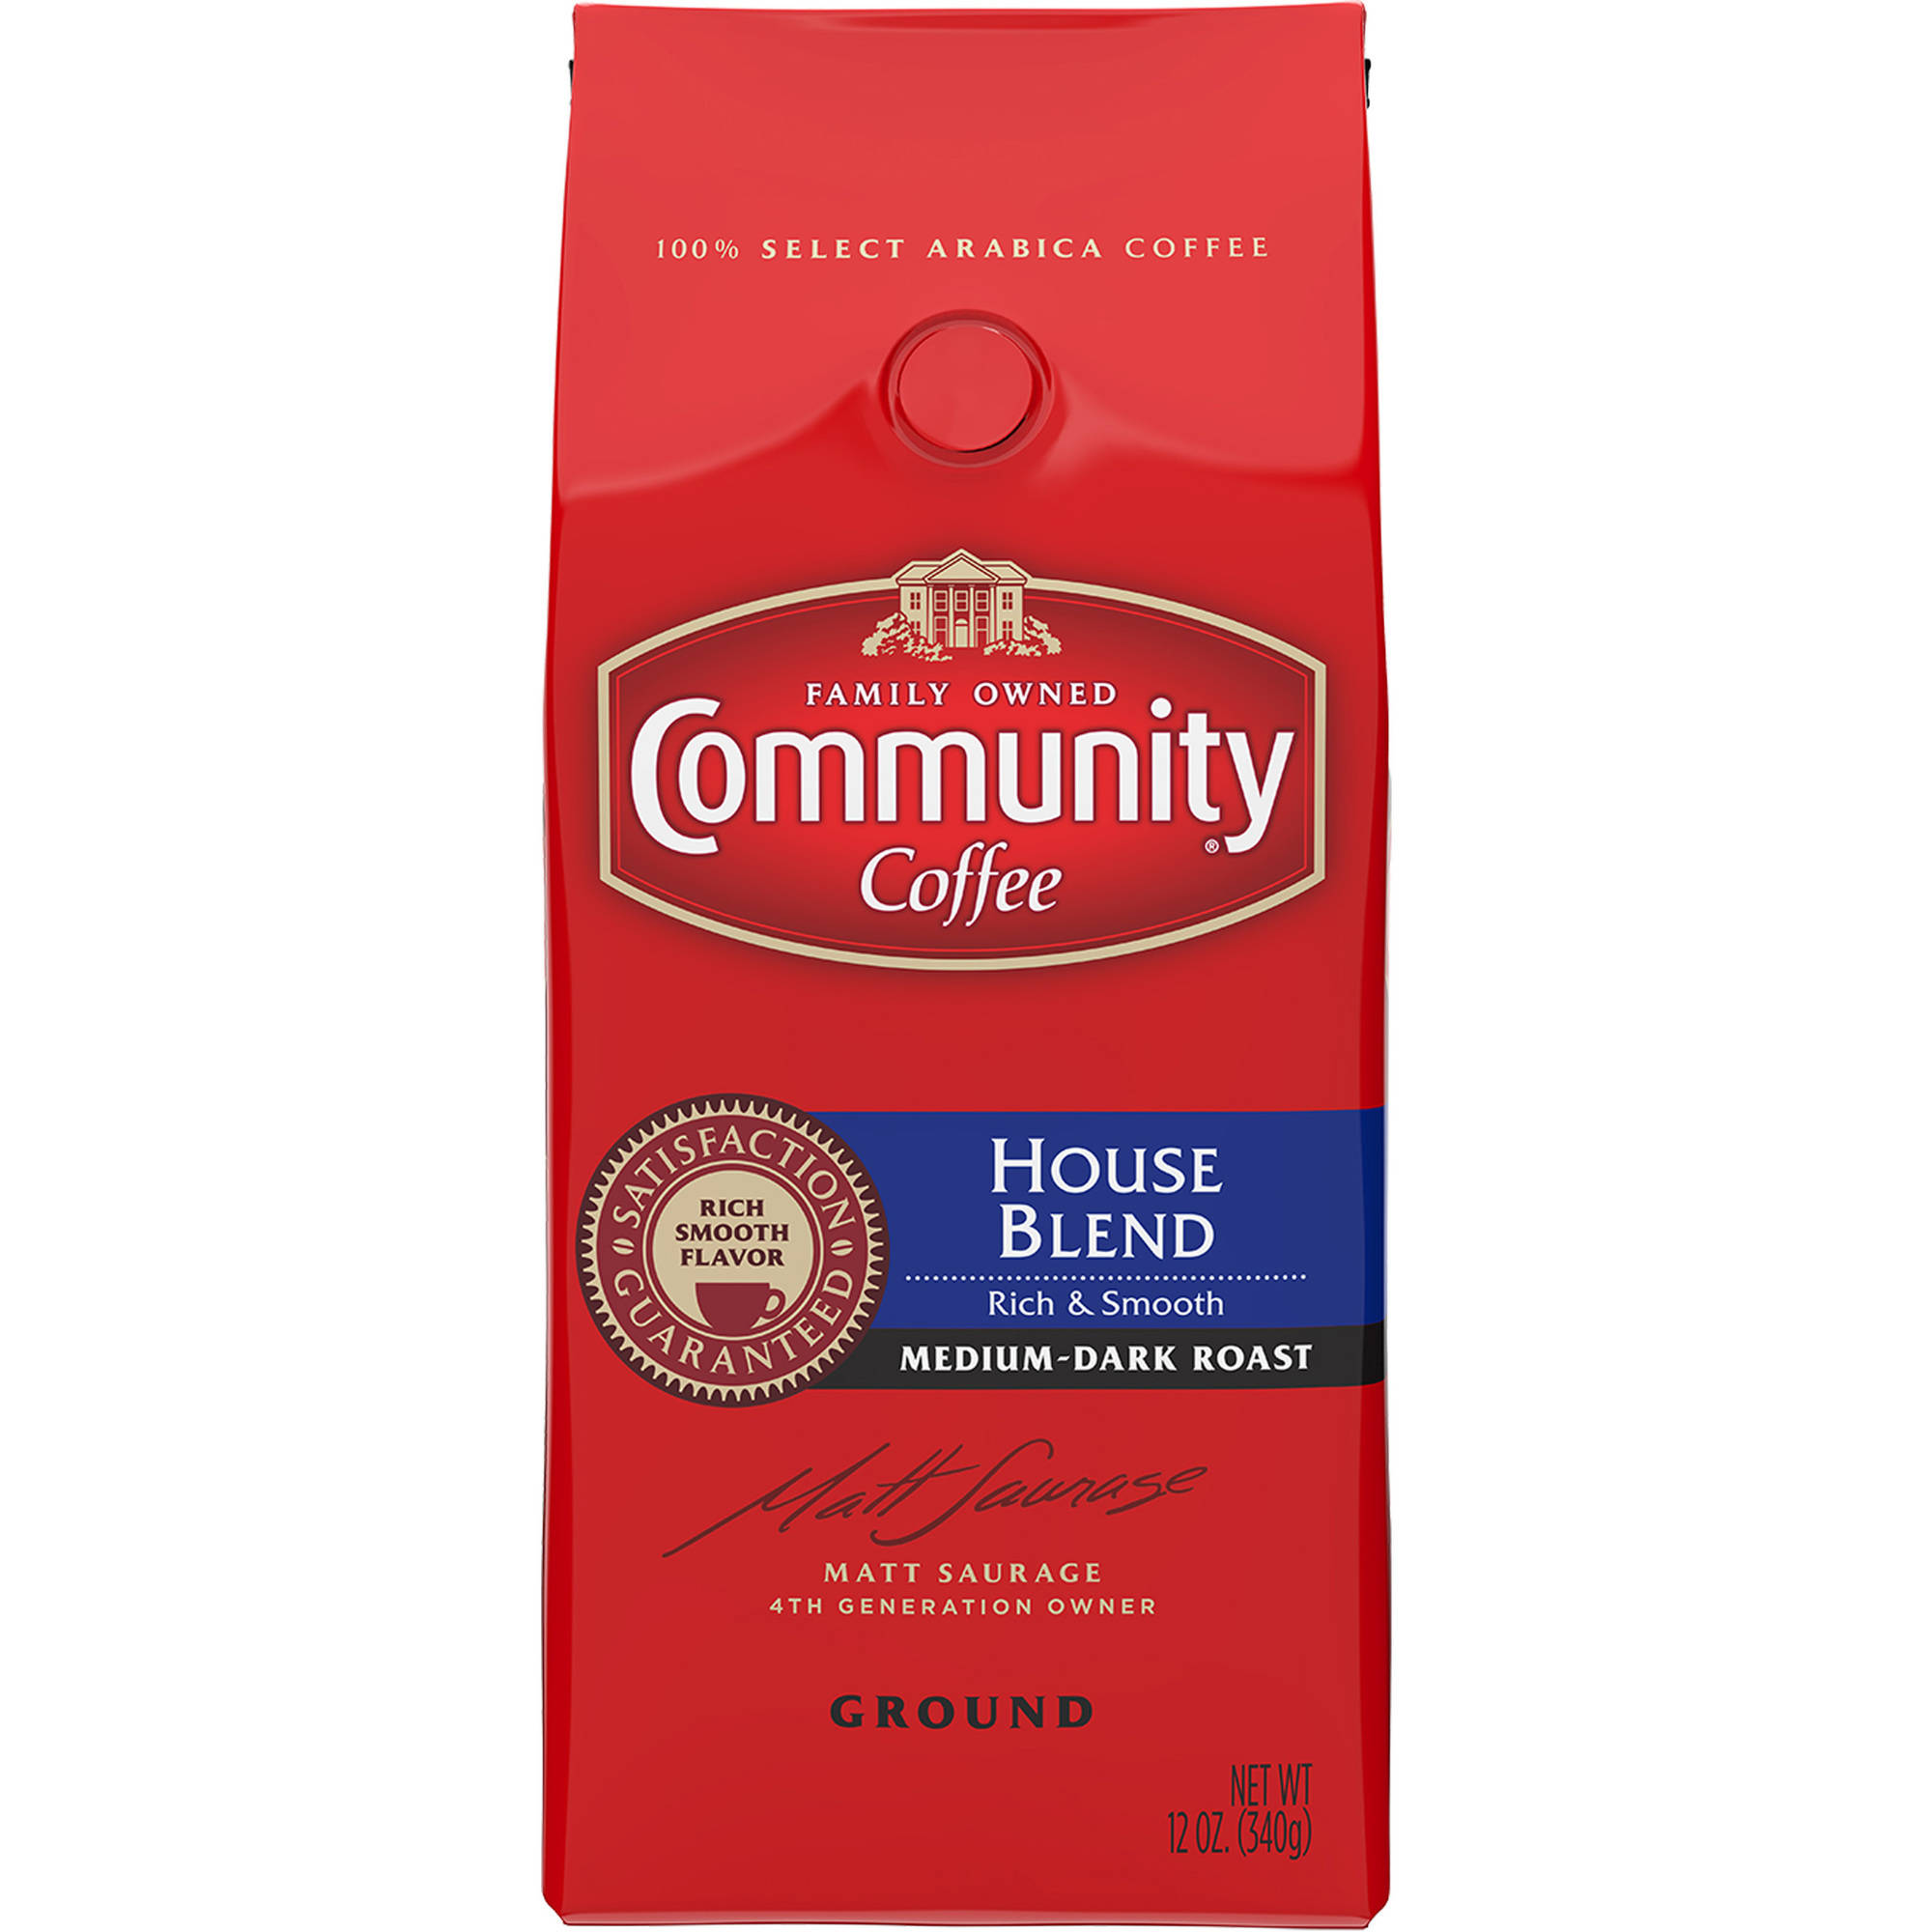 Community Coffee House Blend Medium-Dark Roast Ground Coffee, 12 oz